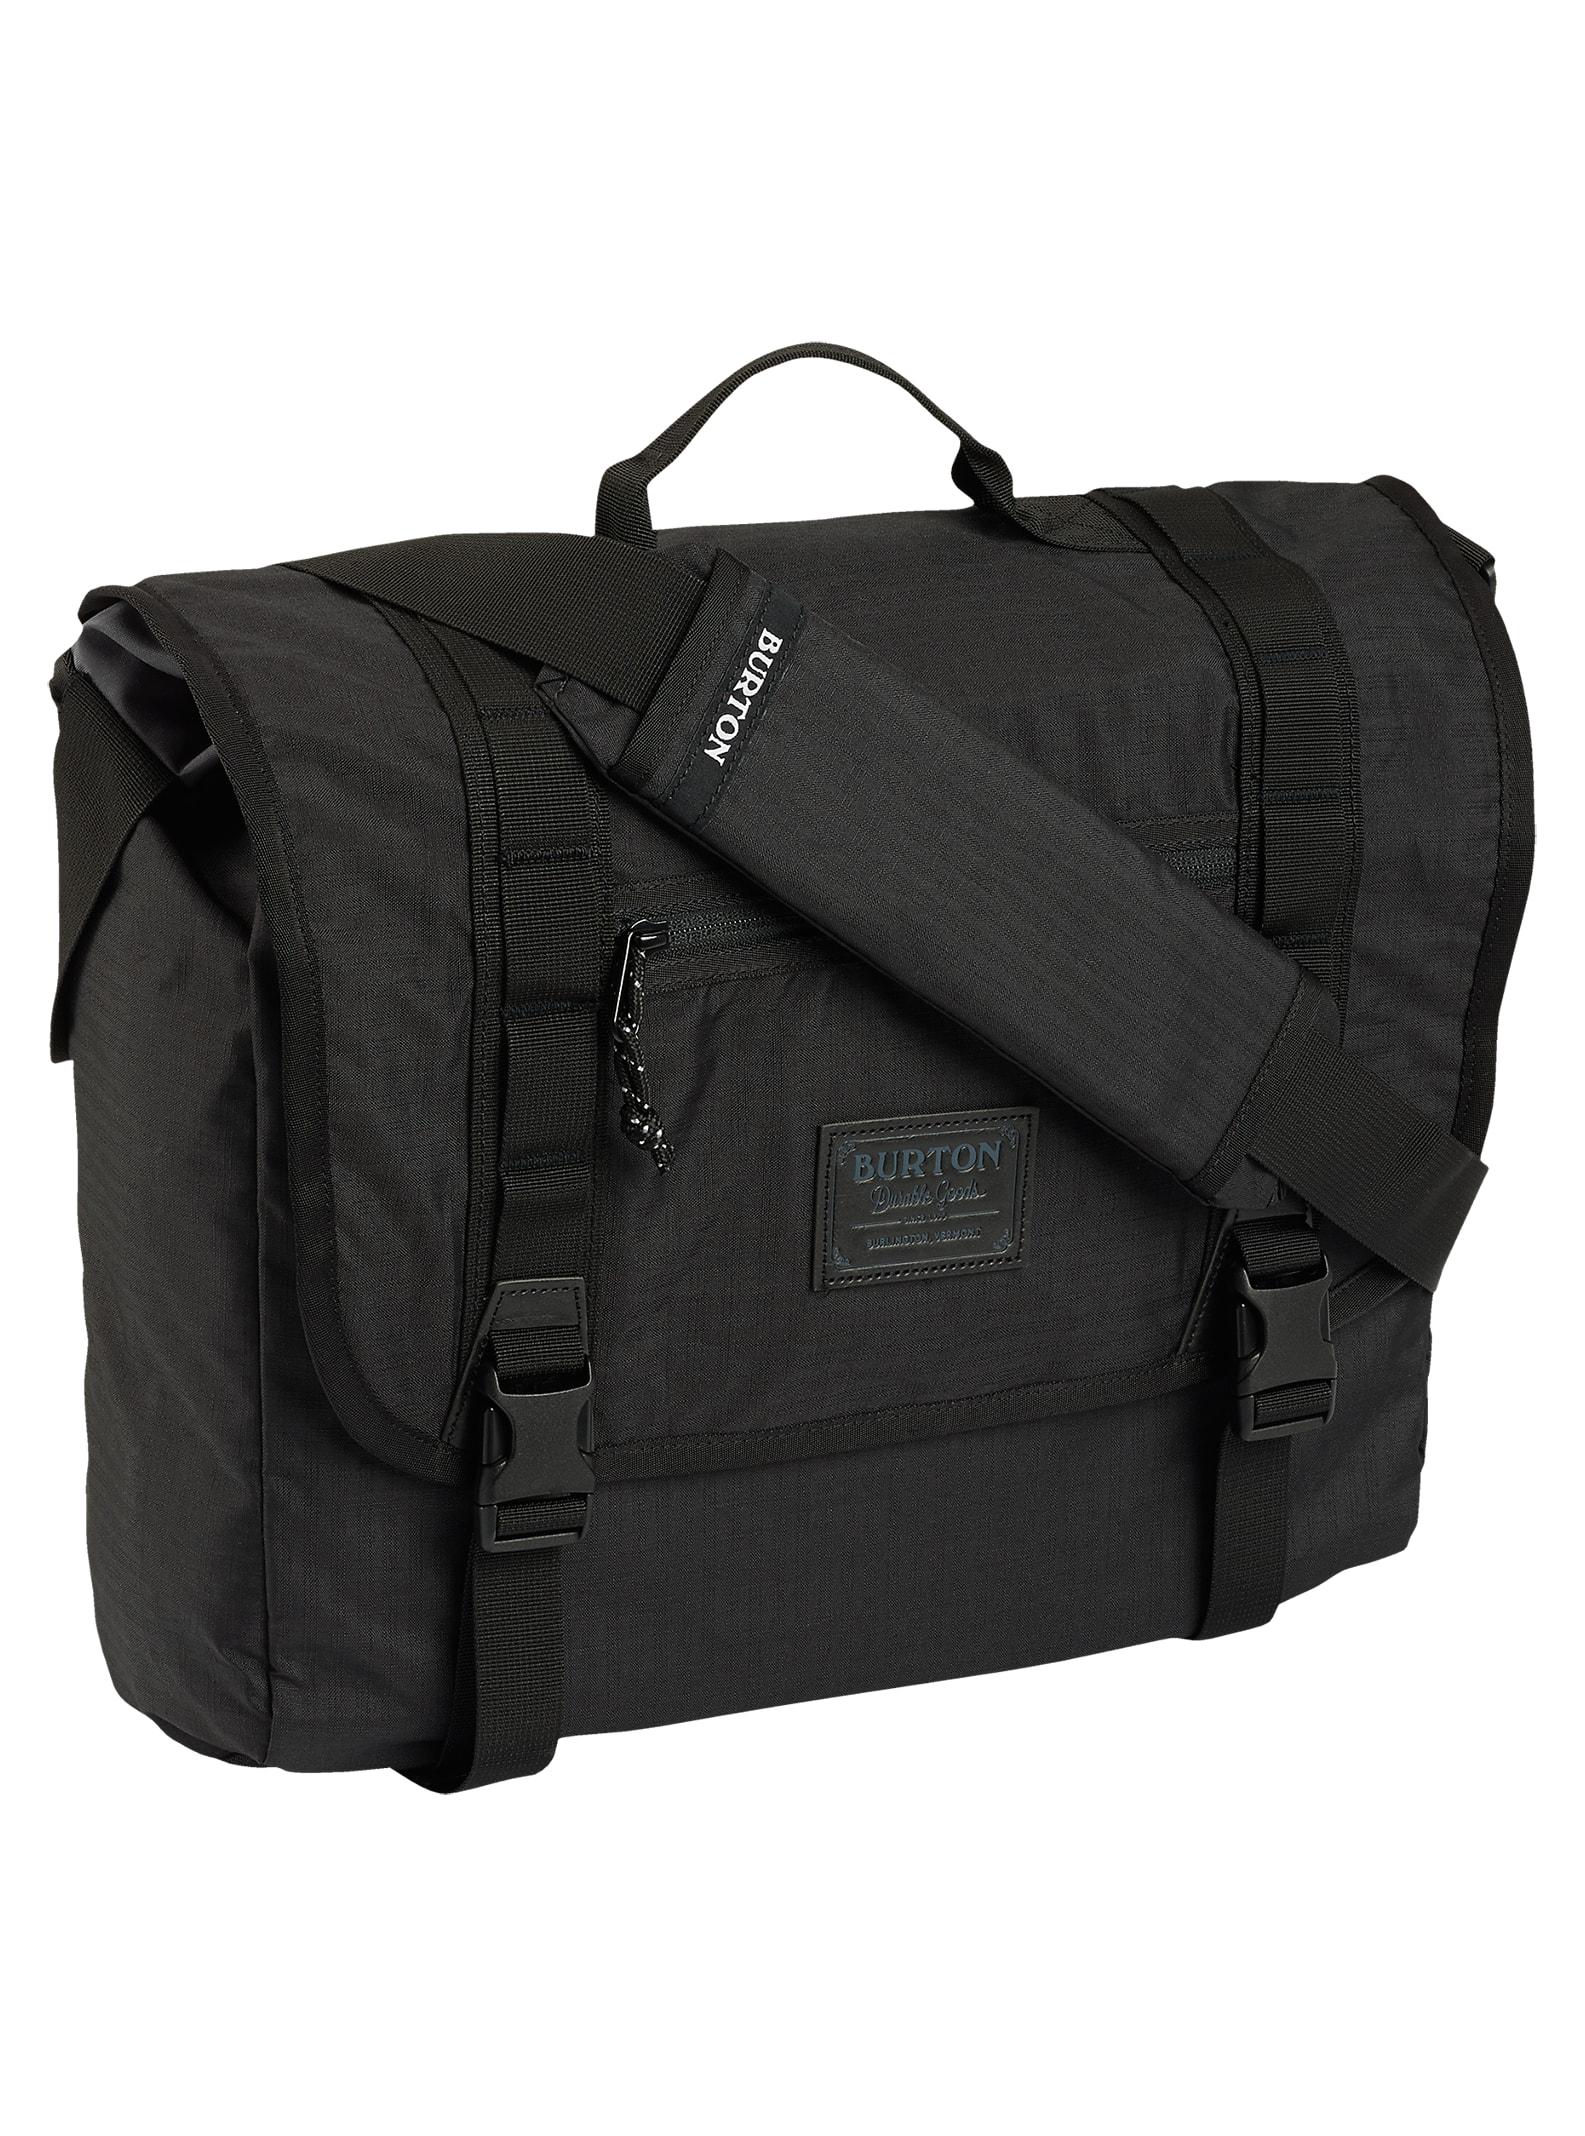 12e74c3f22 Messenger   Duffel Bags